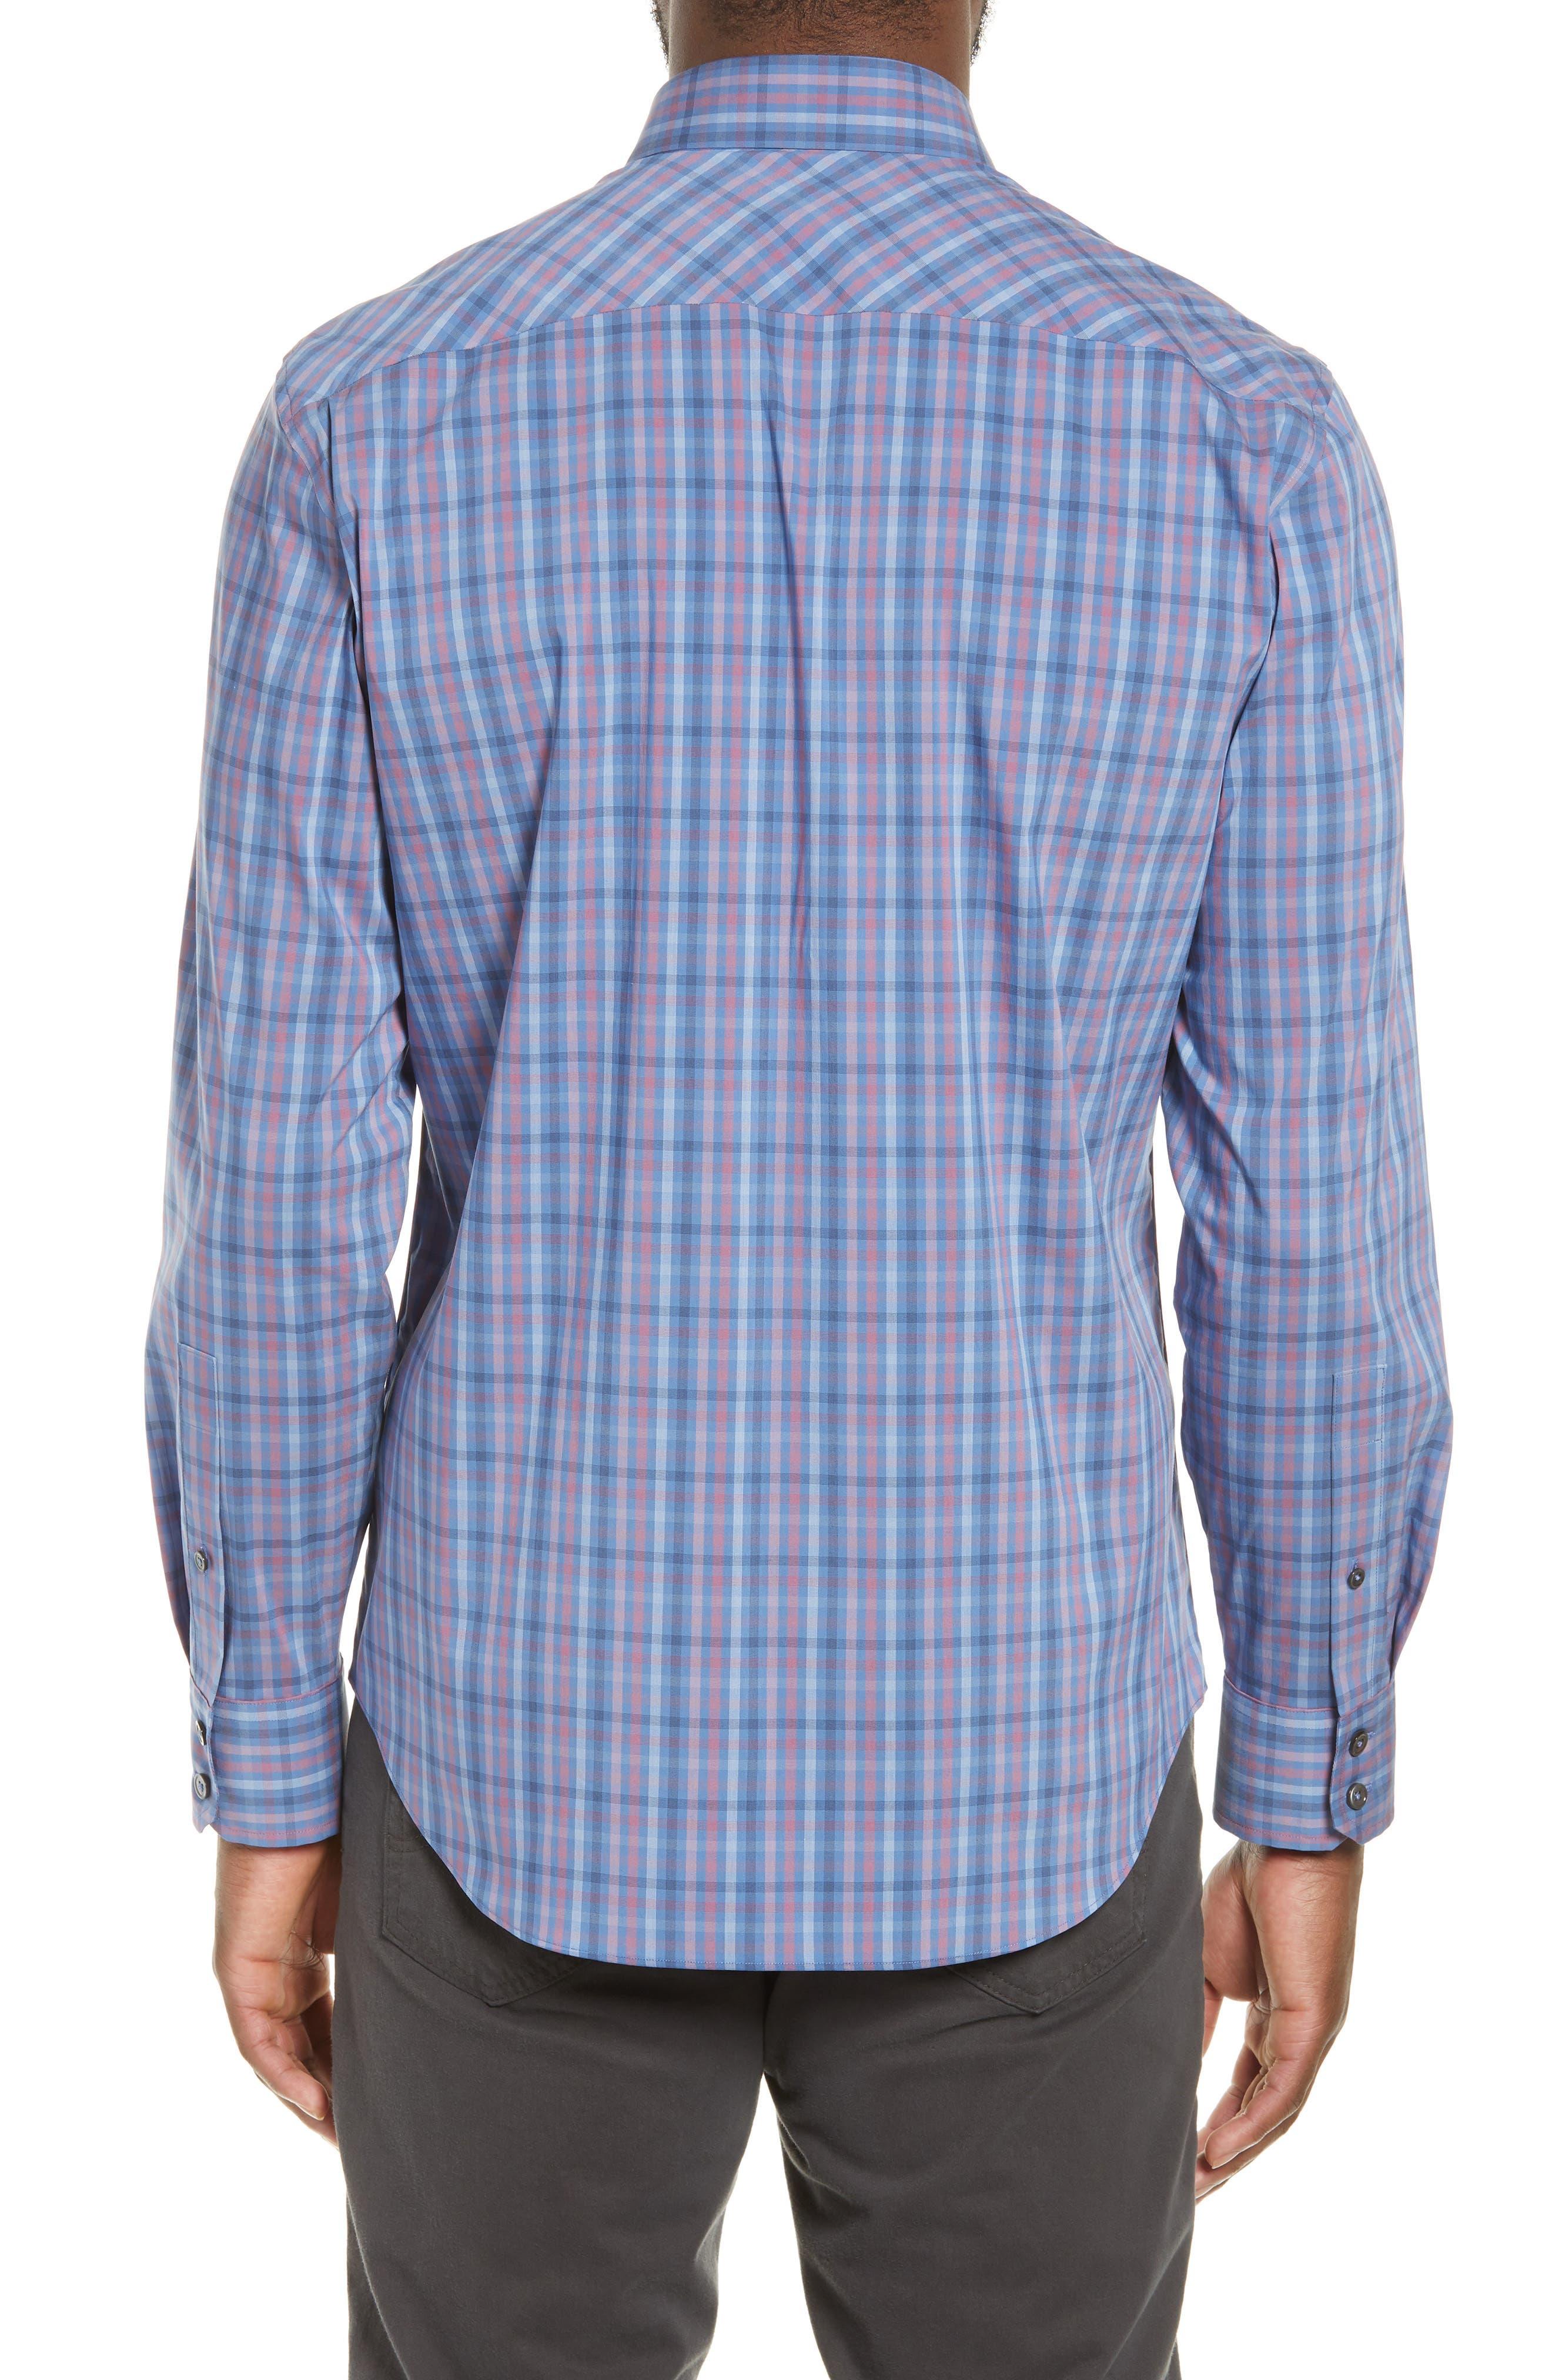 ZACHARY PRELL, Guastella Regular Fit Sport Shirt, Alternate thumbnail 3, color, AZURE